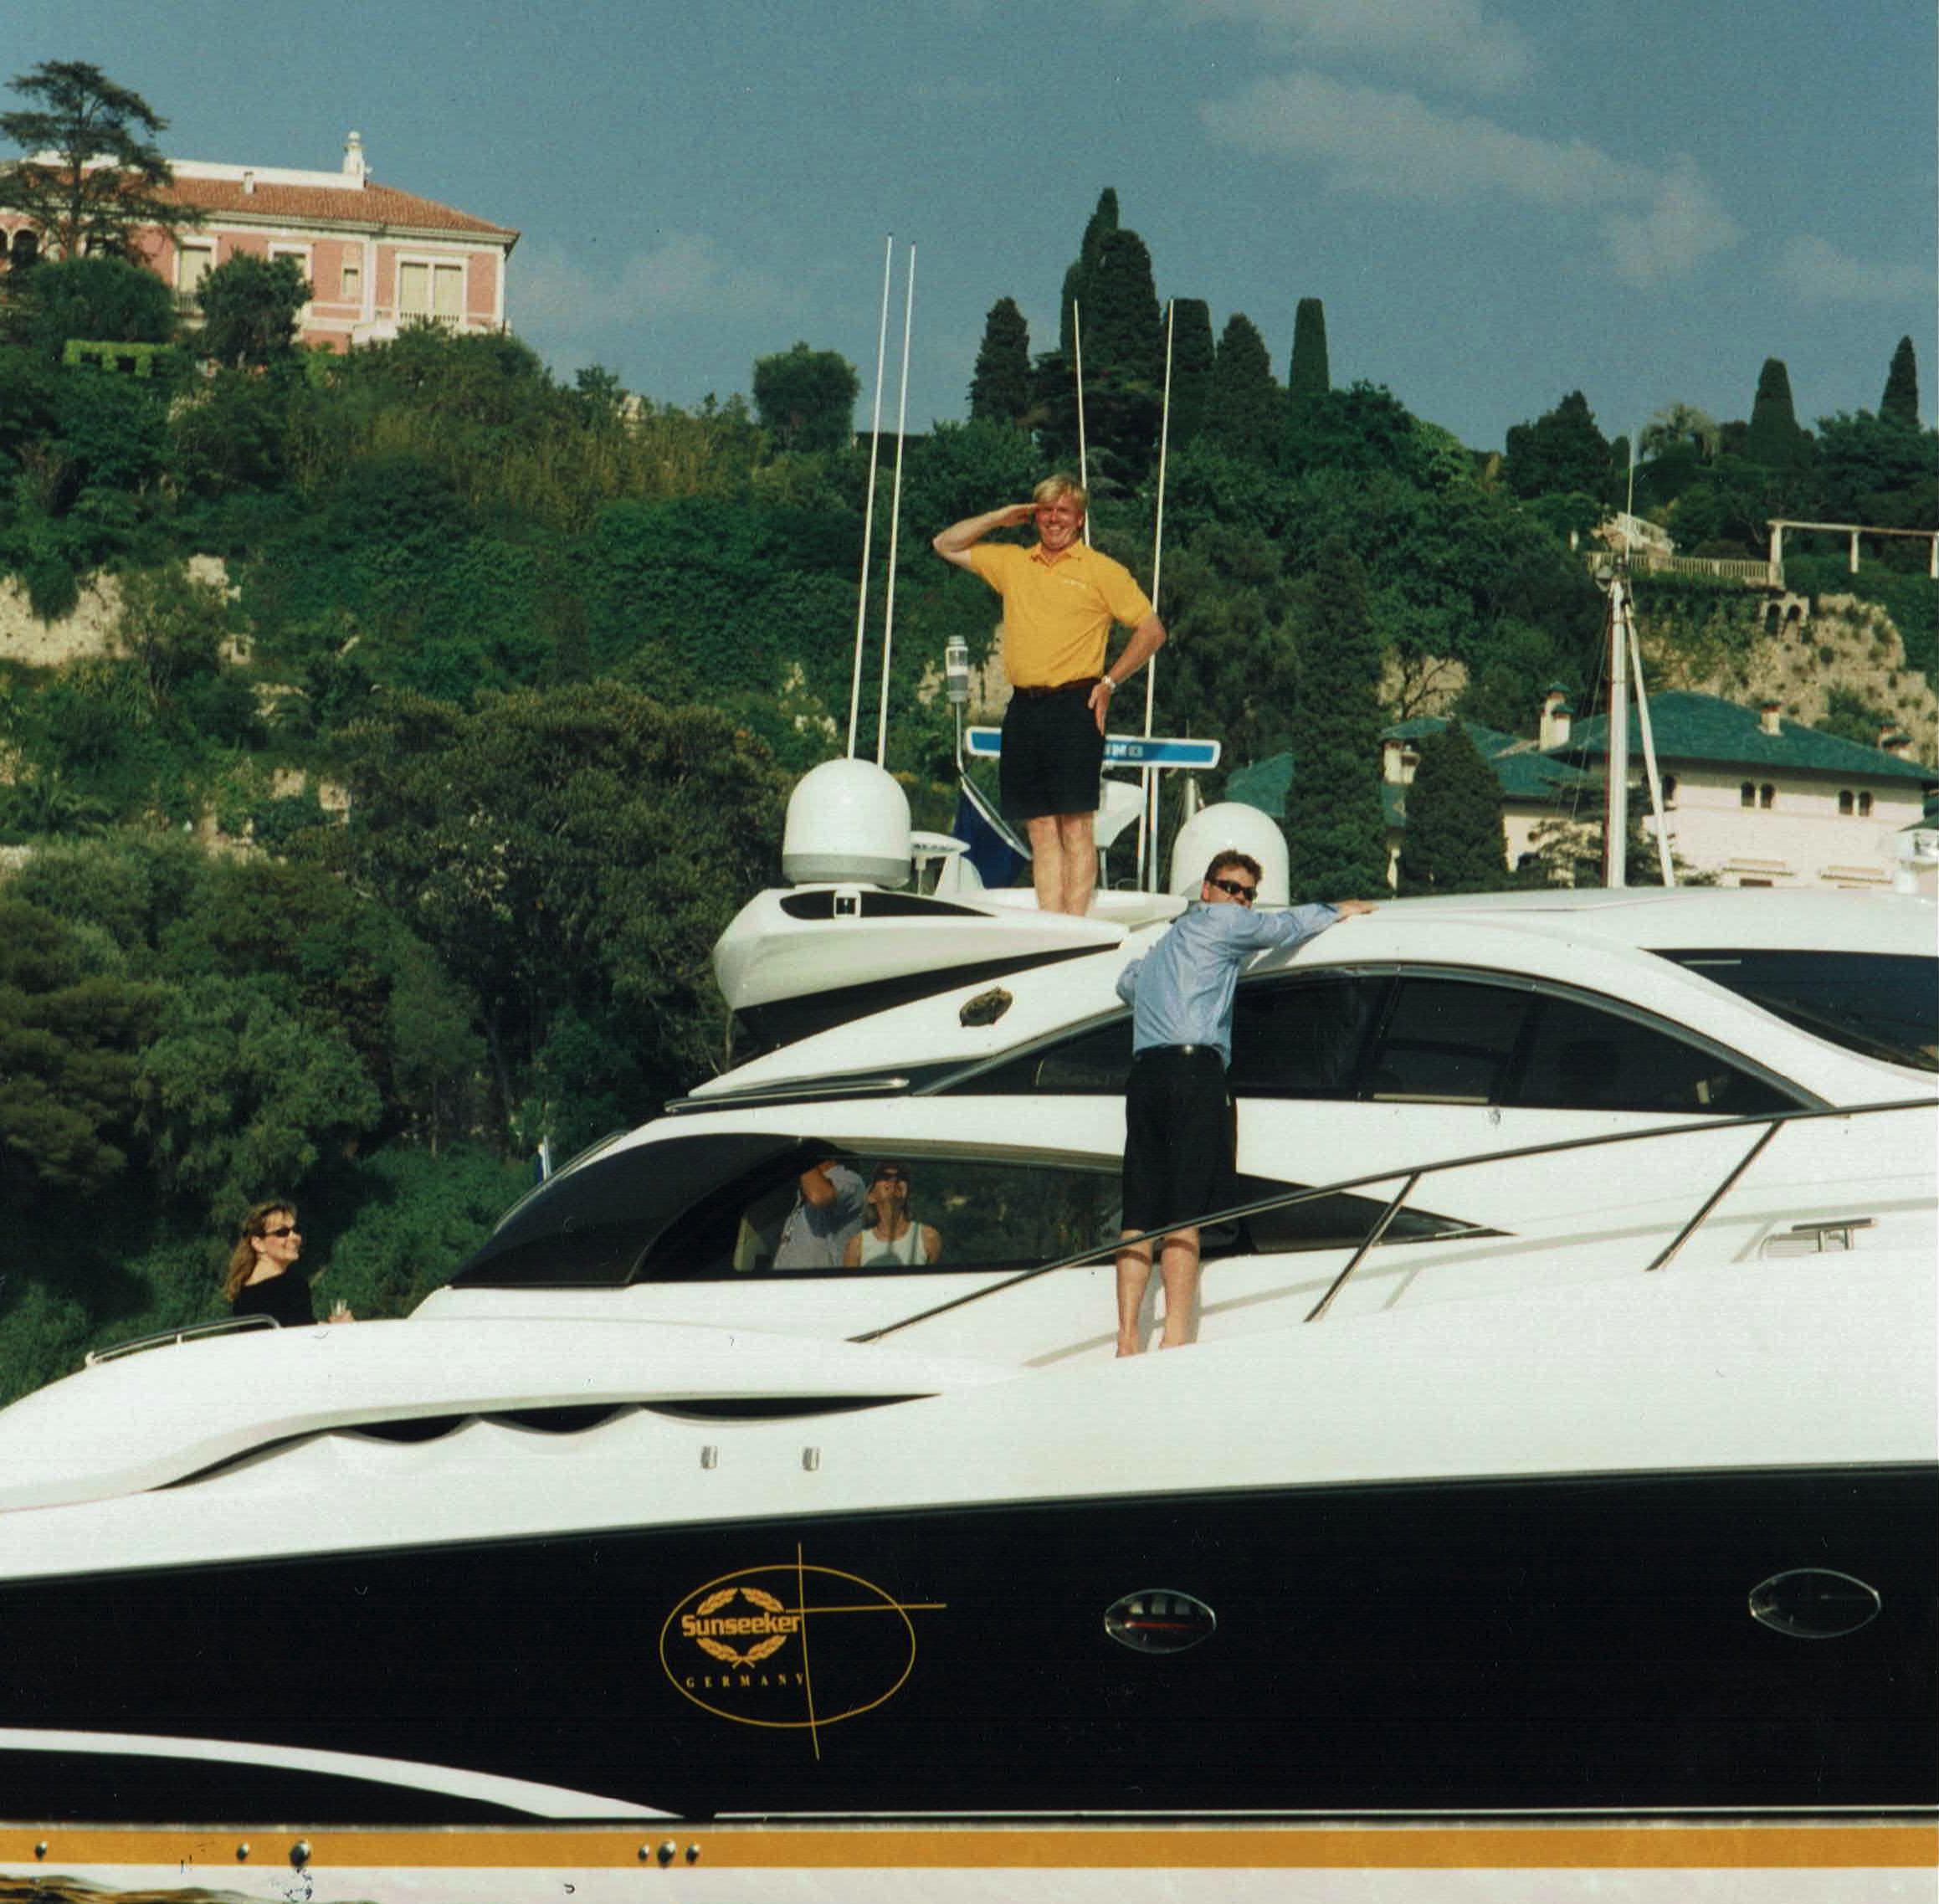 Unsere Story - Sieckmann Yachts